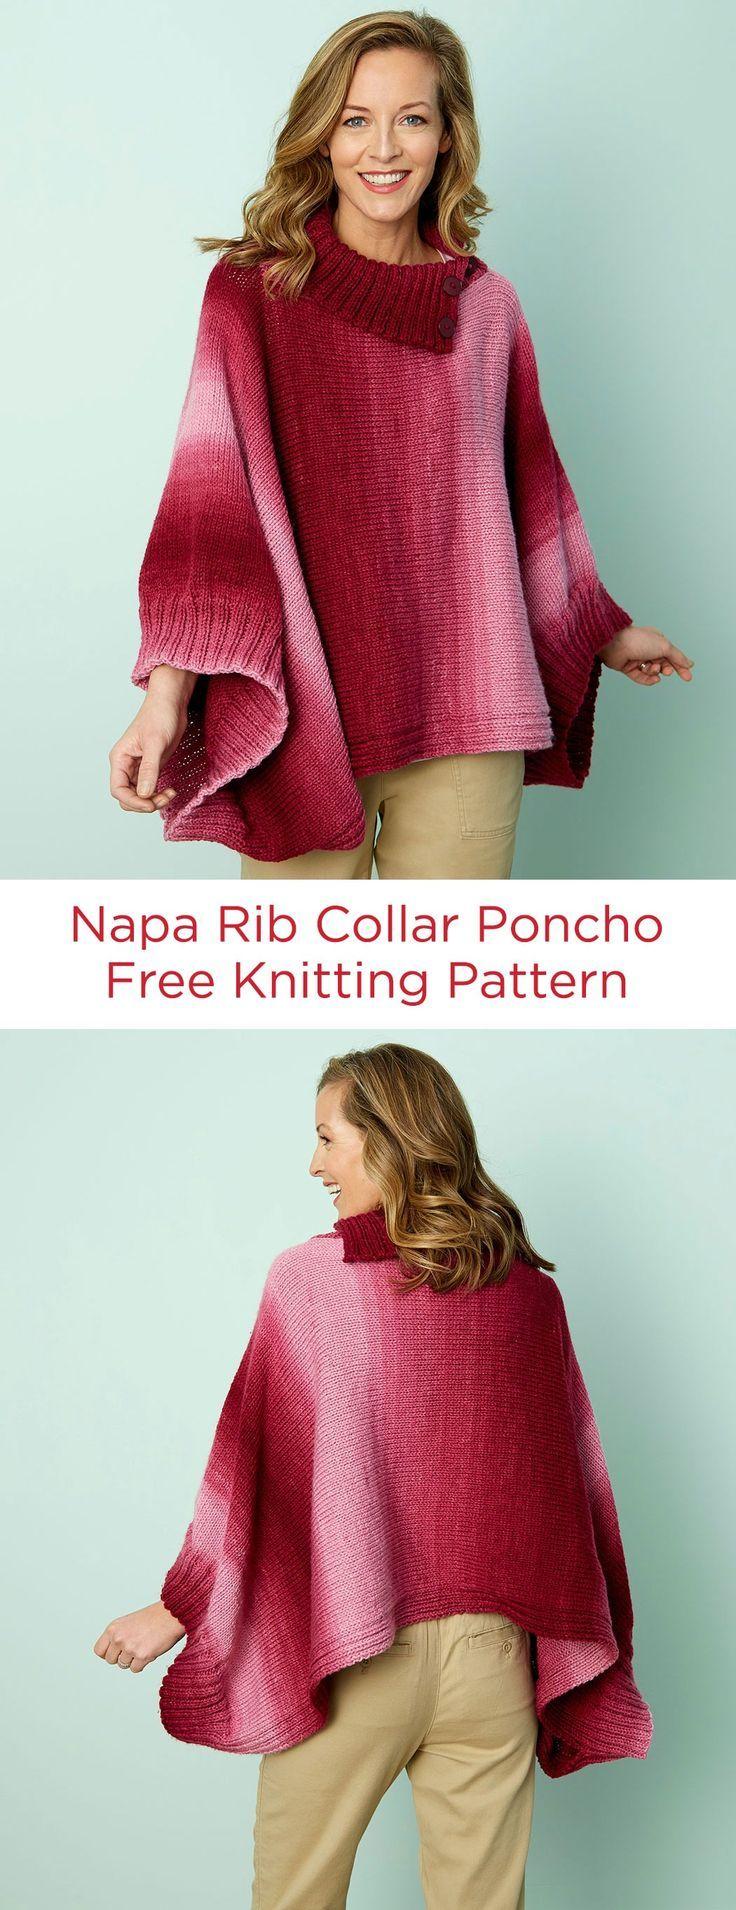 Knitting Patterns For Ponchos And Shawls : Napa rib collar poncho free knitting pattern in red heart